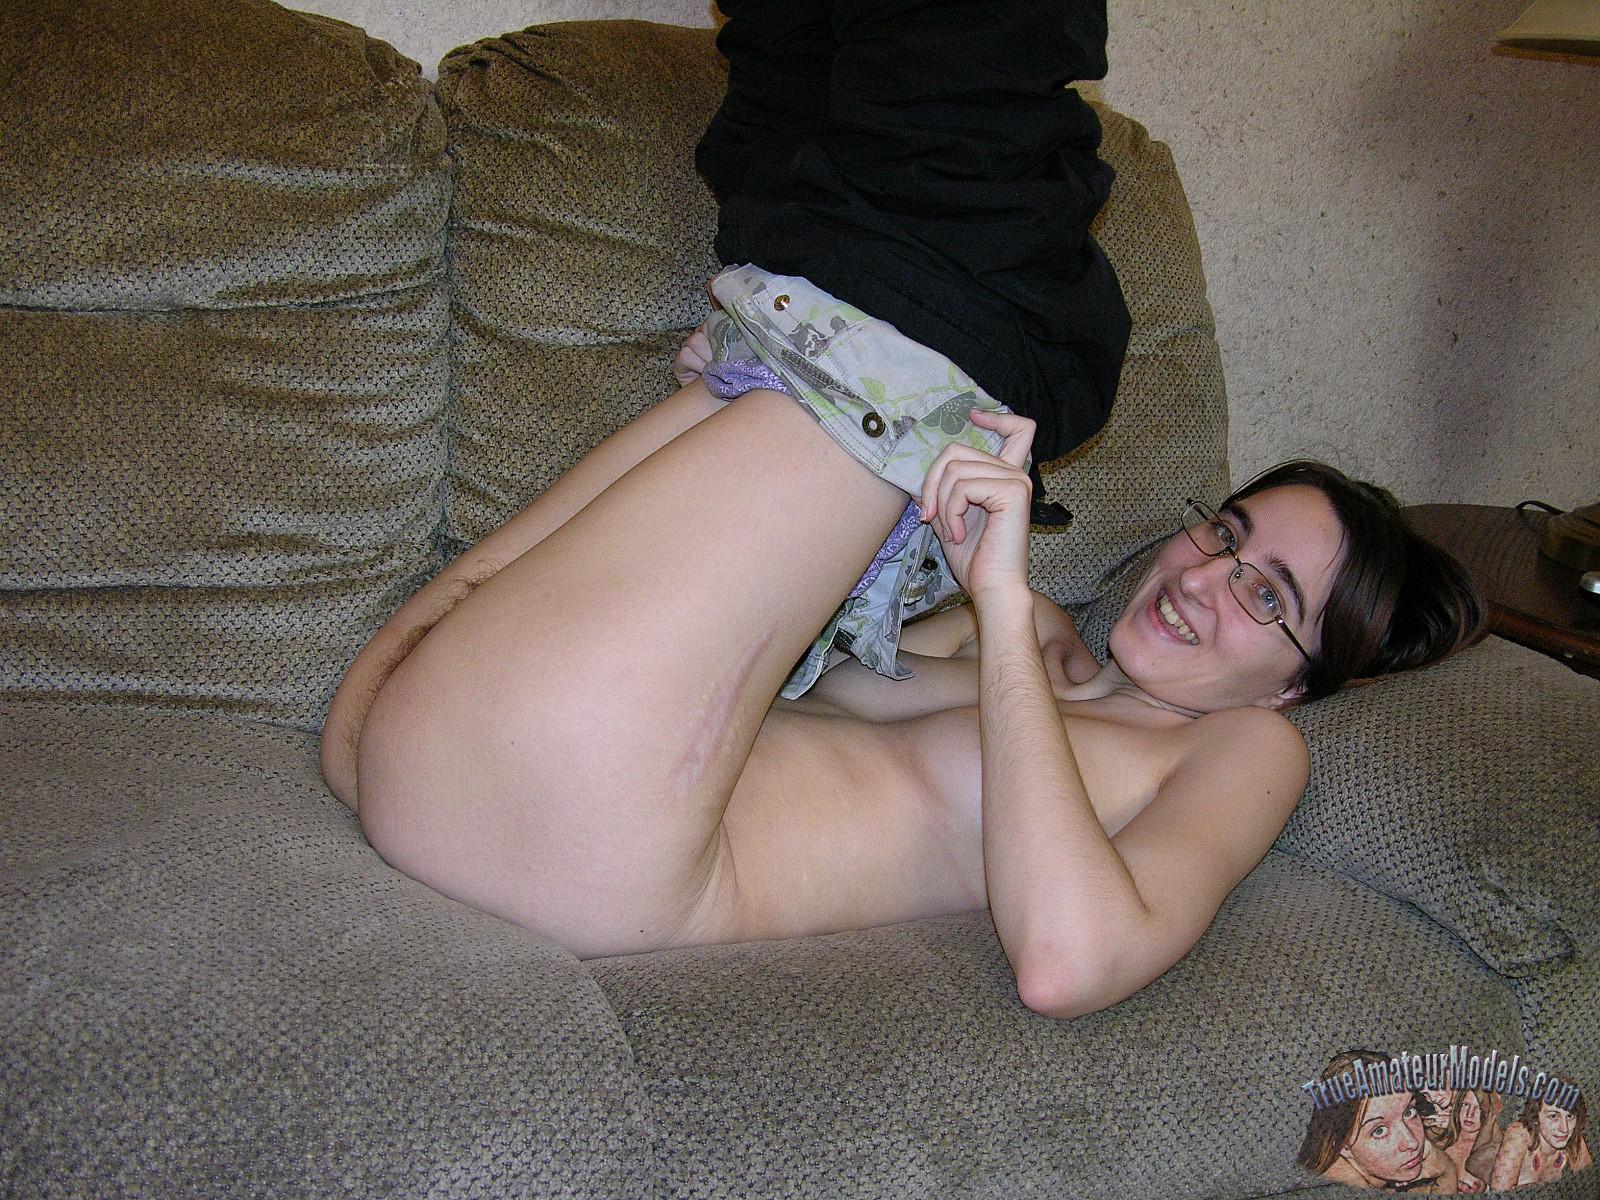 Nude chubby girl amateur nerd